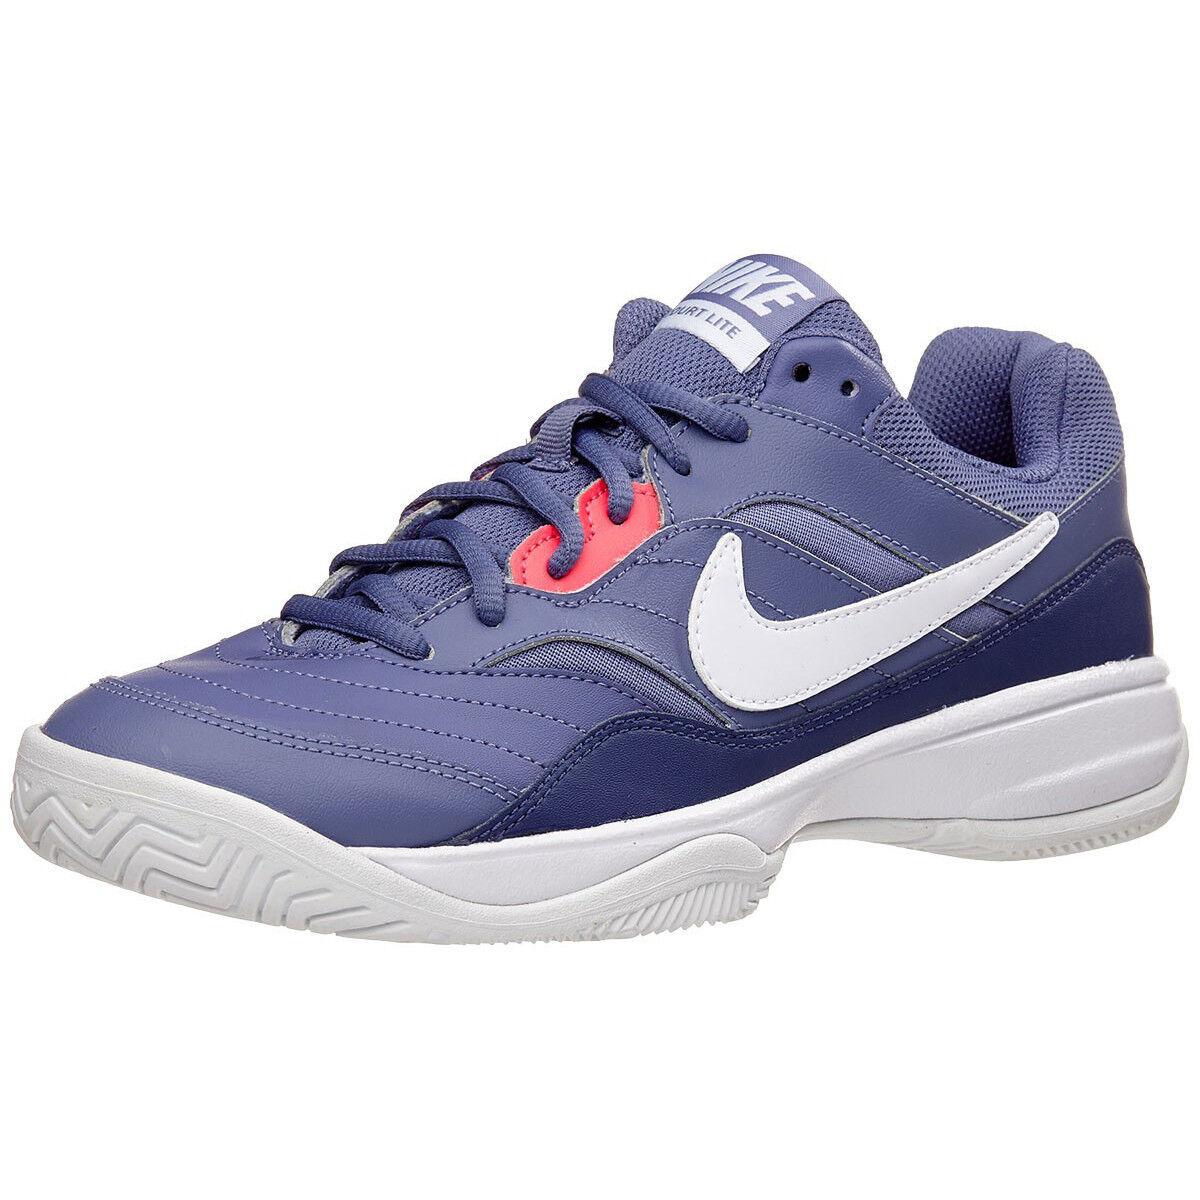 Nike Court Lite Purple Slate 7.5 Women's Tennis Shoes Size 7.5 Slate f2db1c